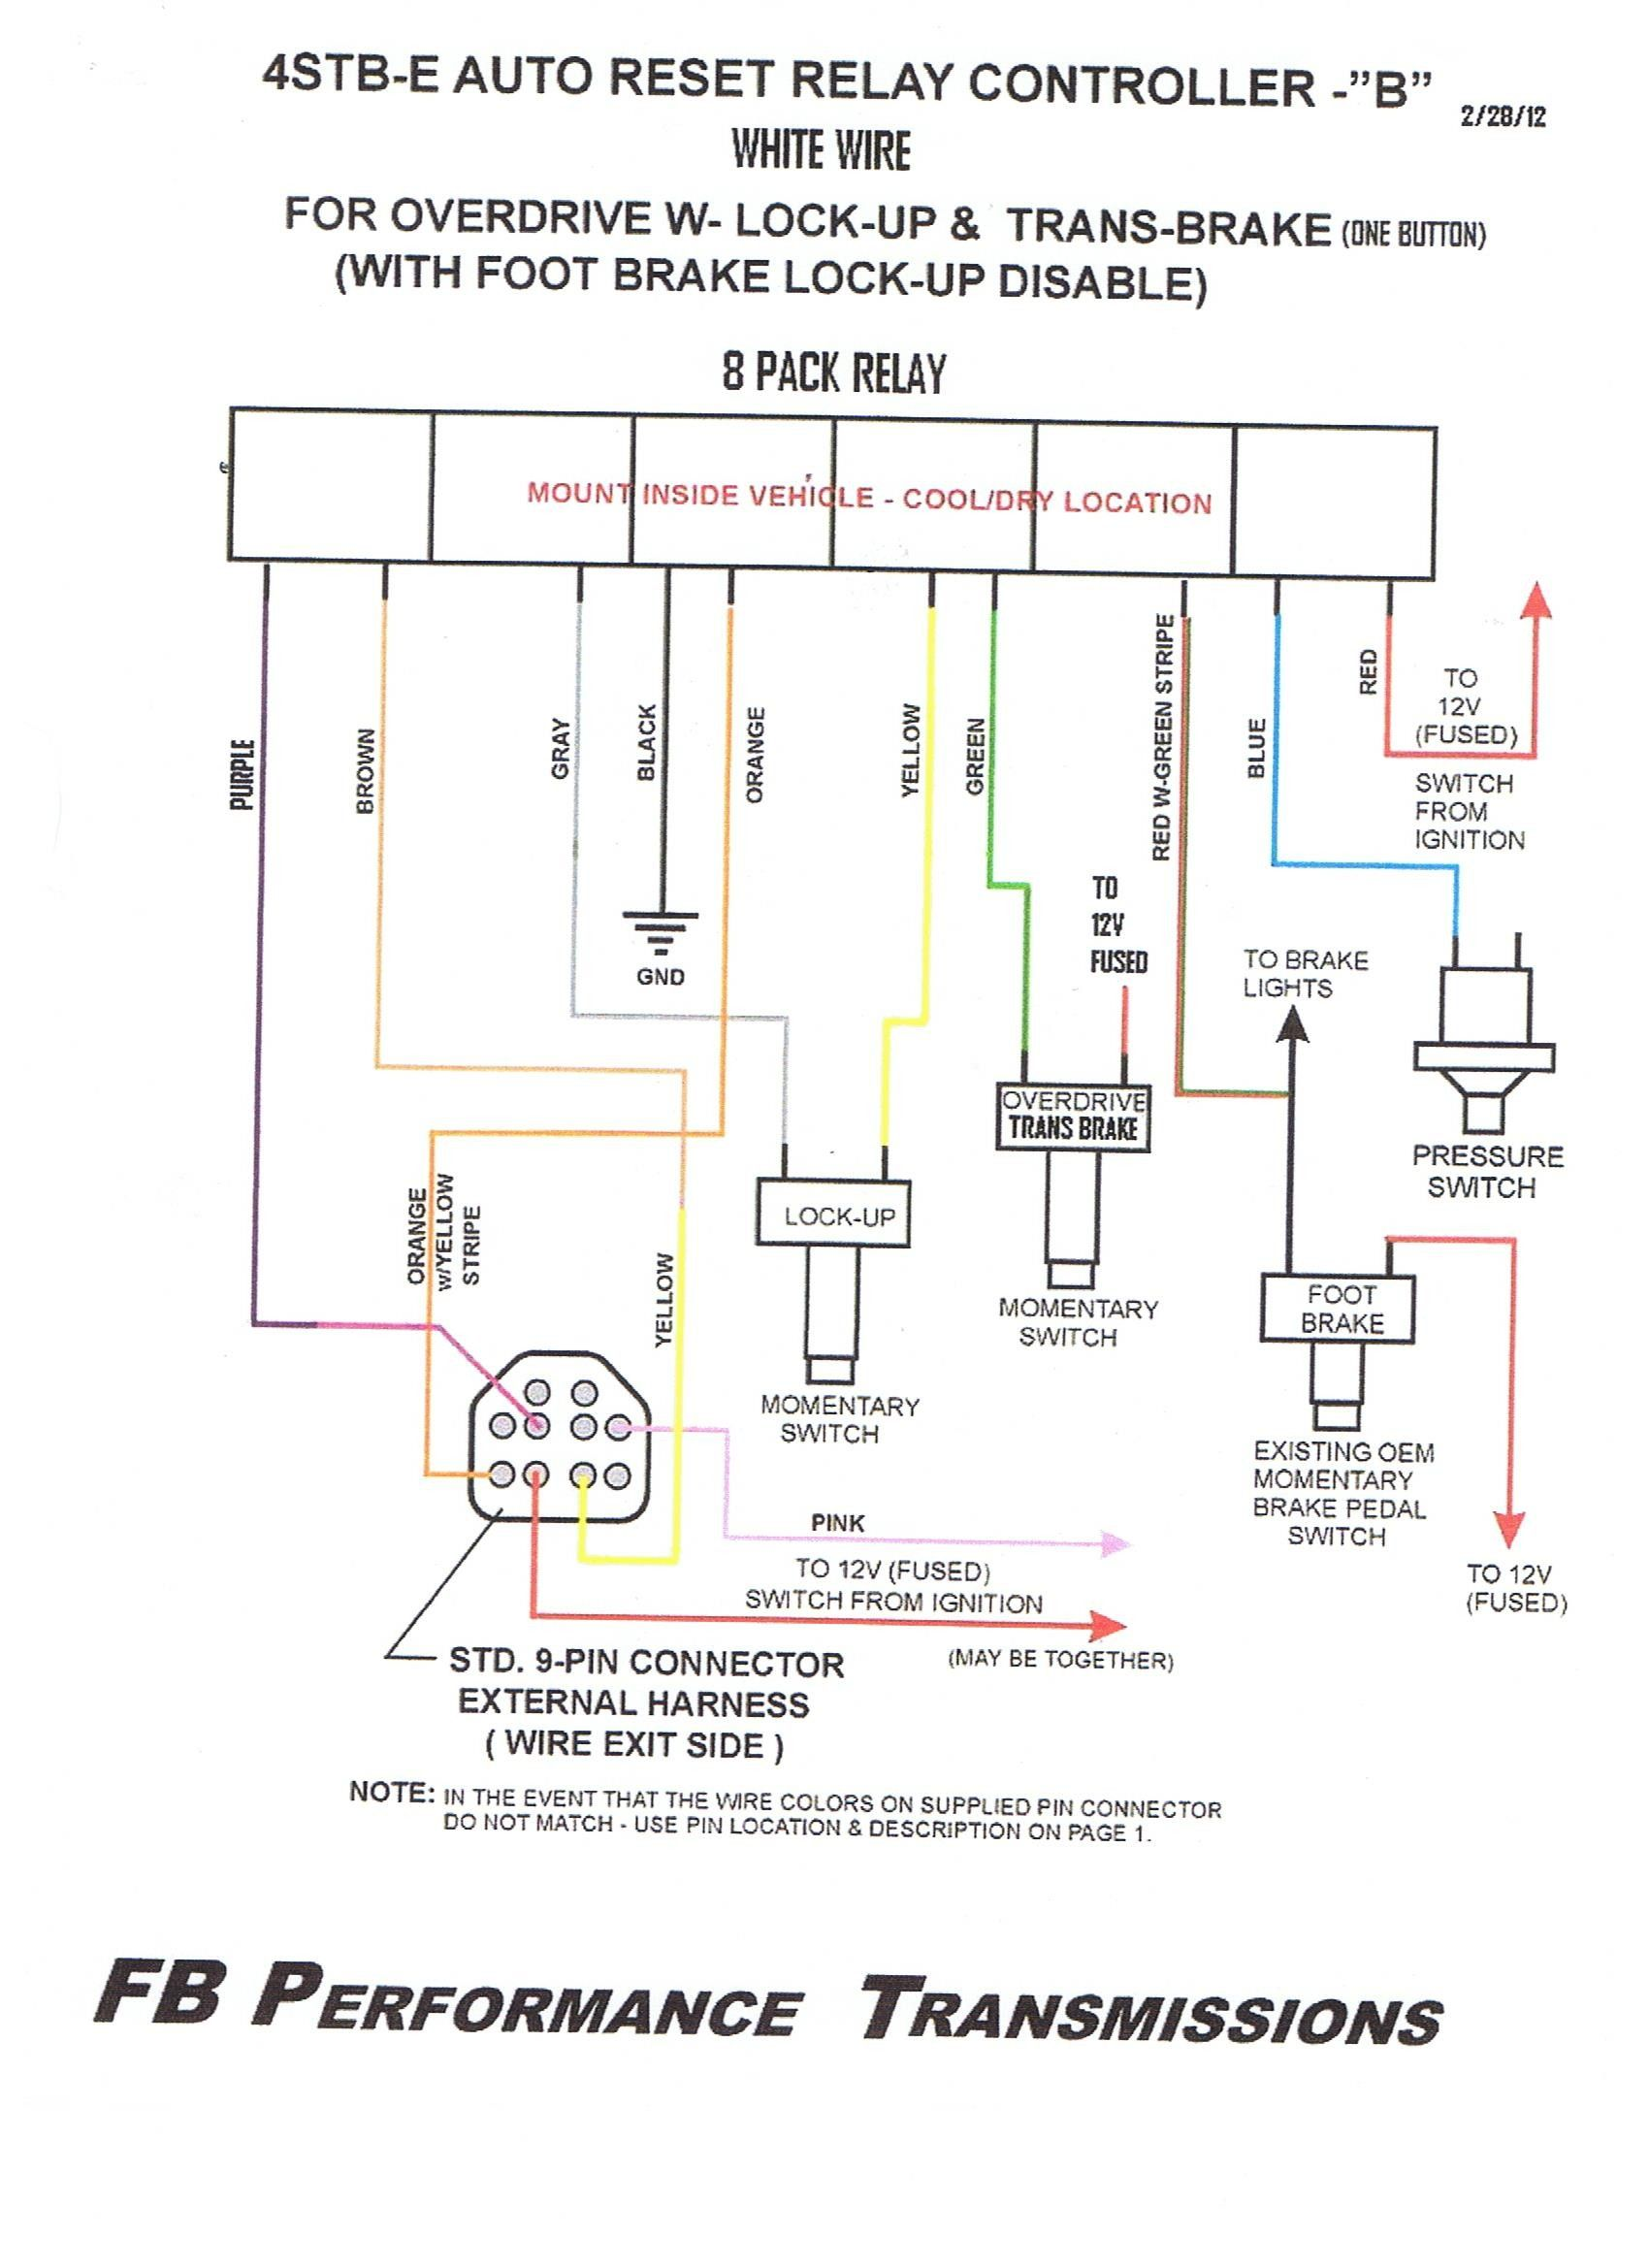 Automatic Transmission Schematic Diagram In 2021 Wiring Diagram Electrical Diagram Diagram